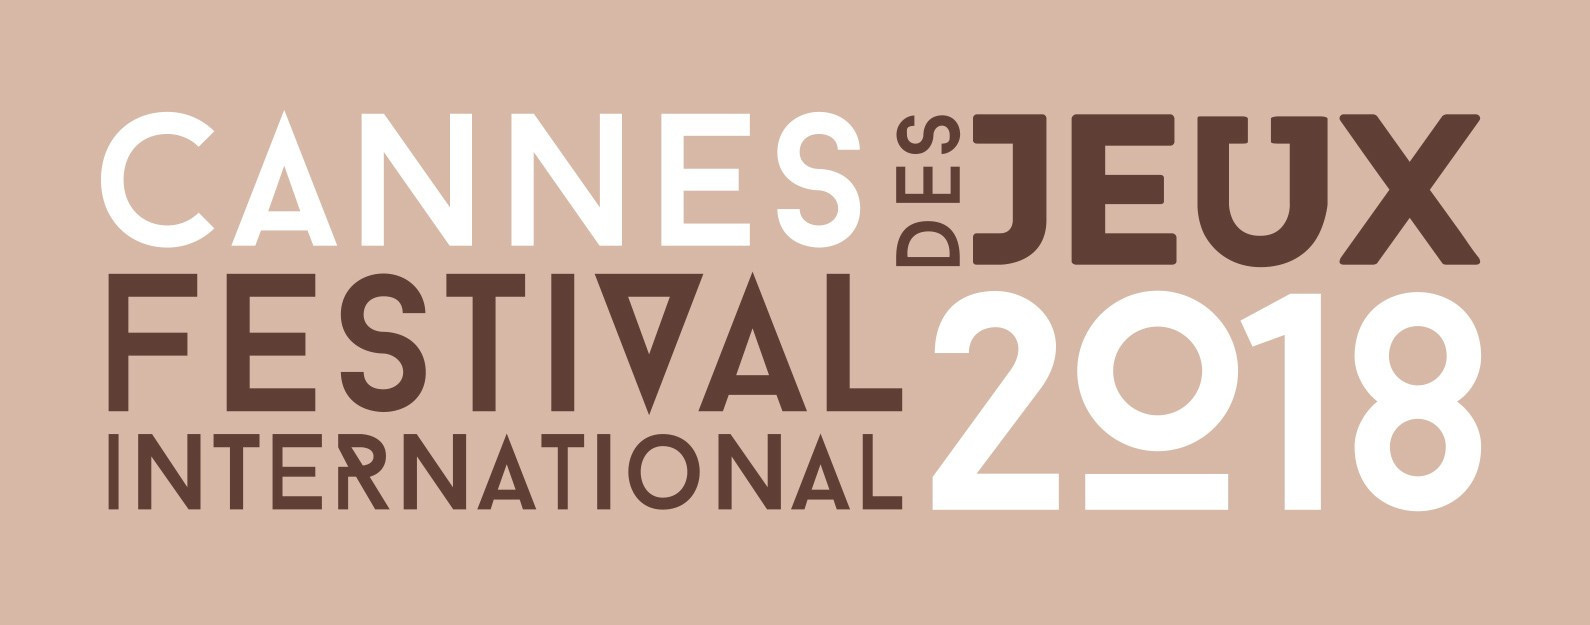 bandeau Cannes 2018 date